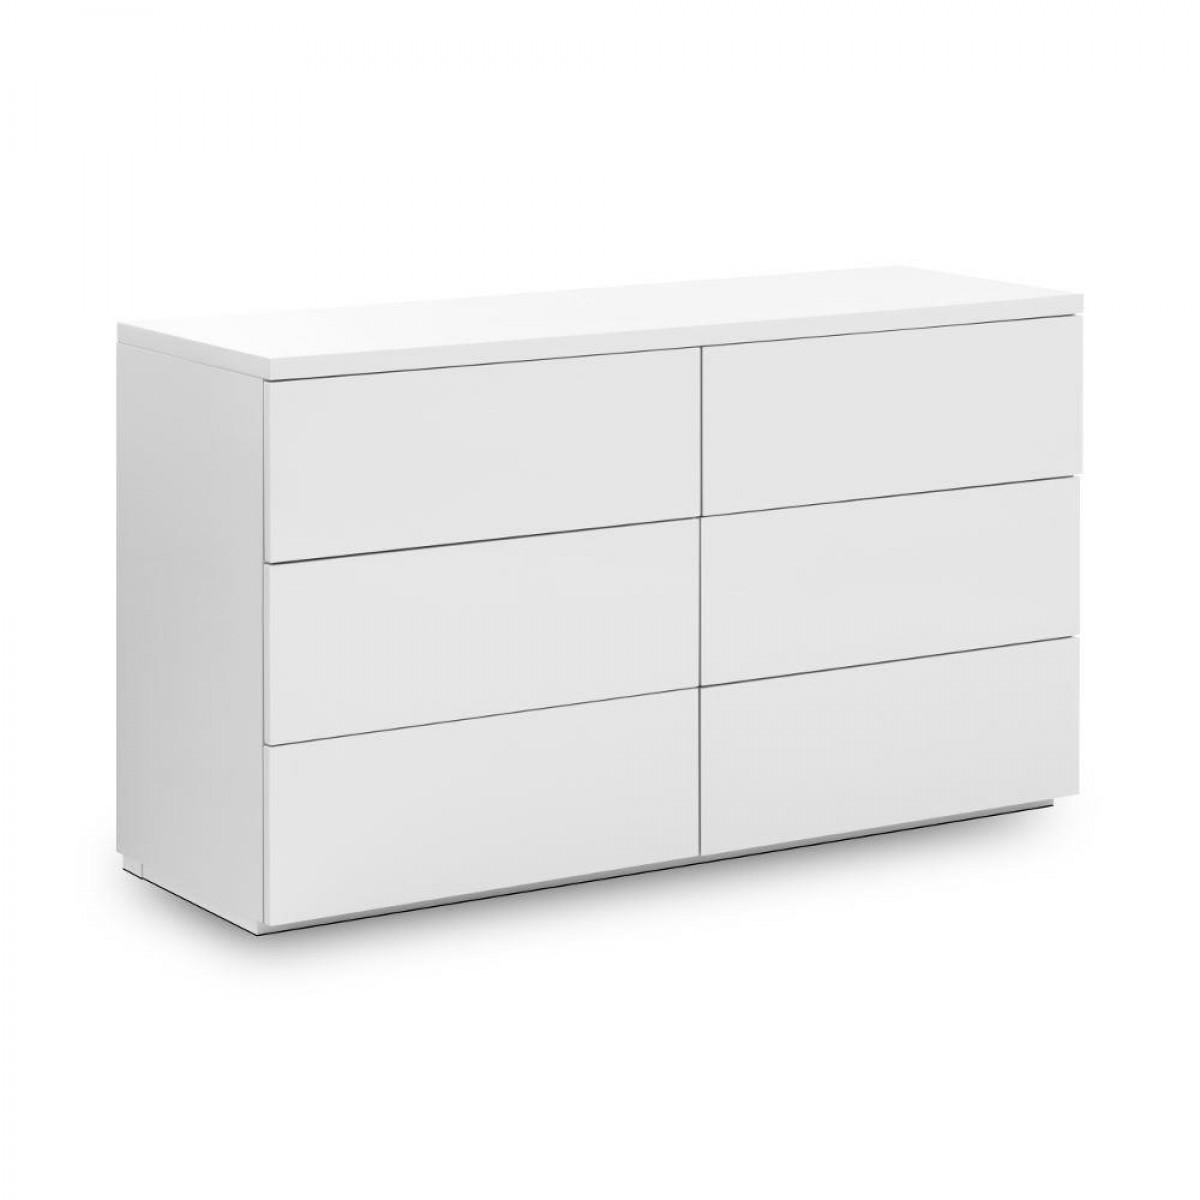 Monaco White Wooden High Gloss 6 Drawer Chest